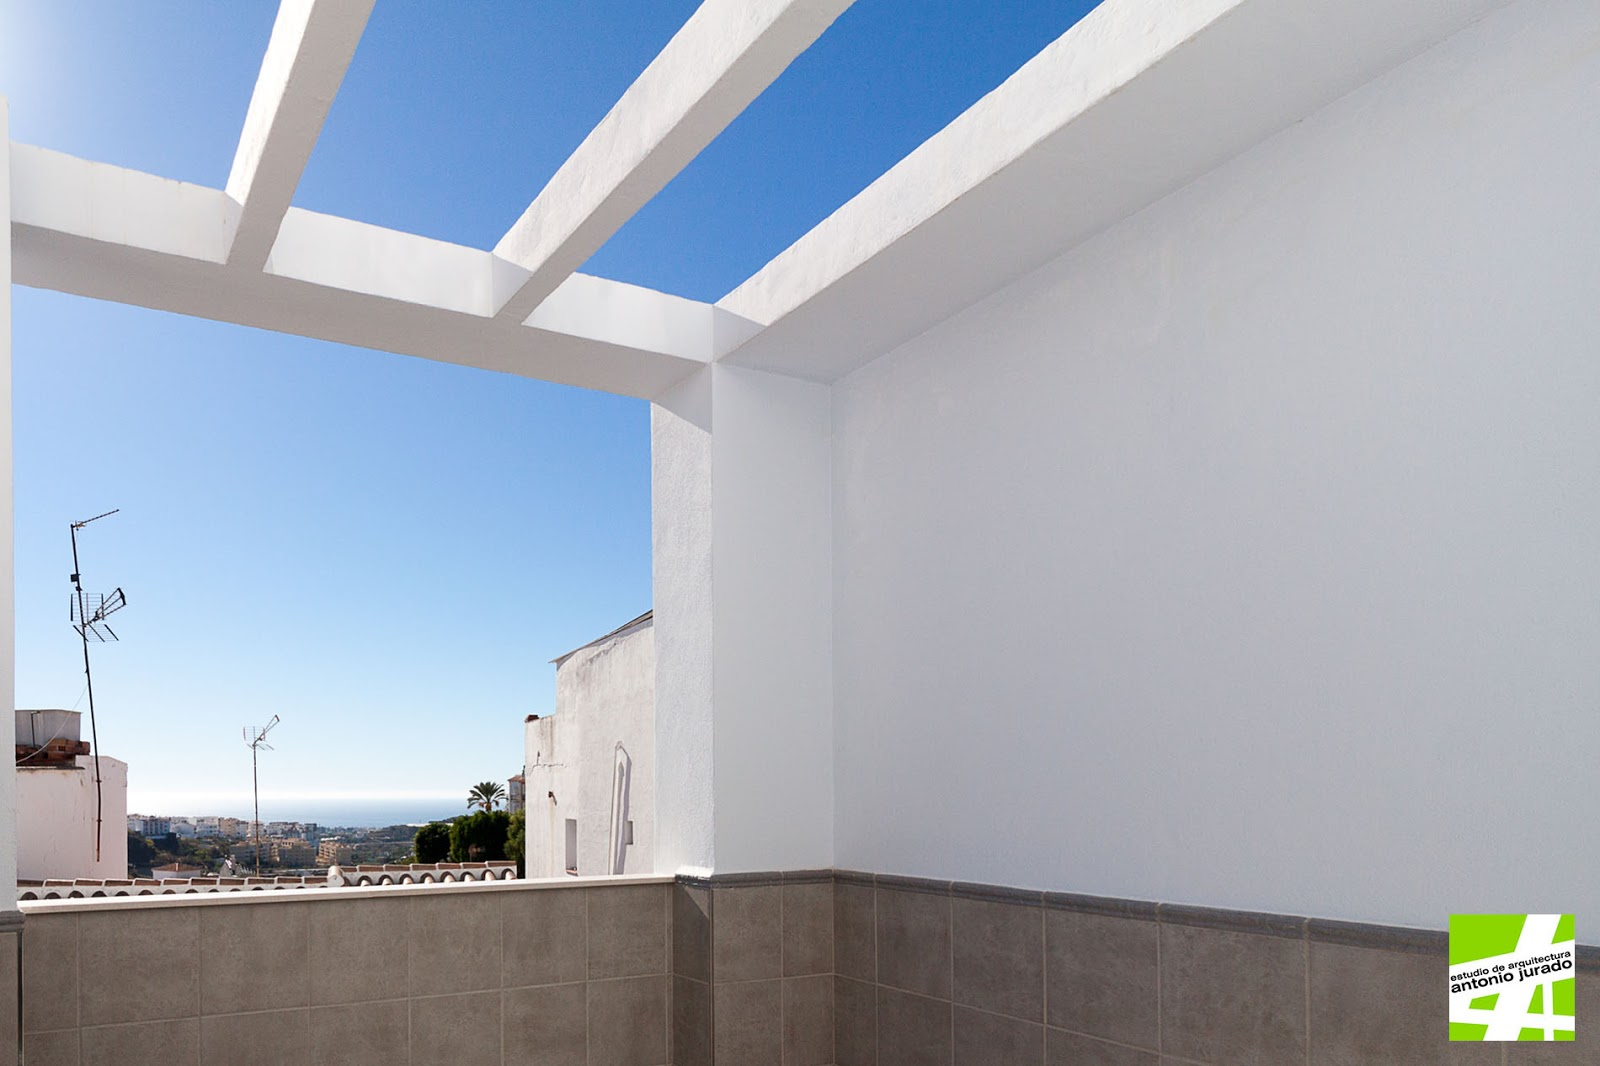 casa-sc-torrox-reforma-ampliacion-vivienda-antonio-jurado-arquitecto-torrox-malaga-05